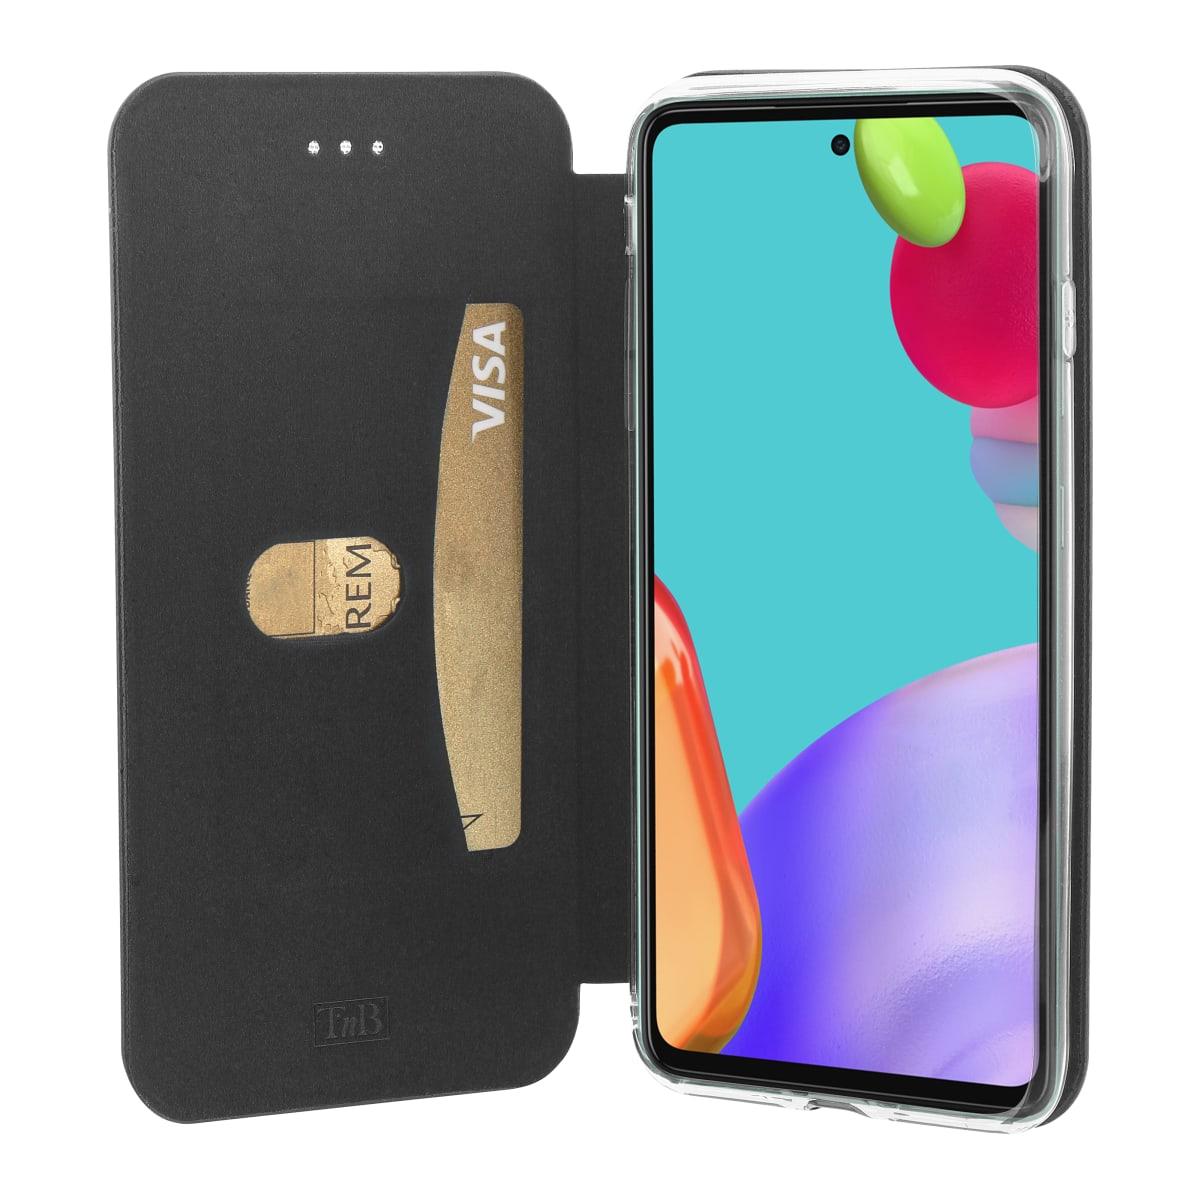 Premium folio case for Samsung Galaxy A52 4G and 5G